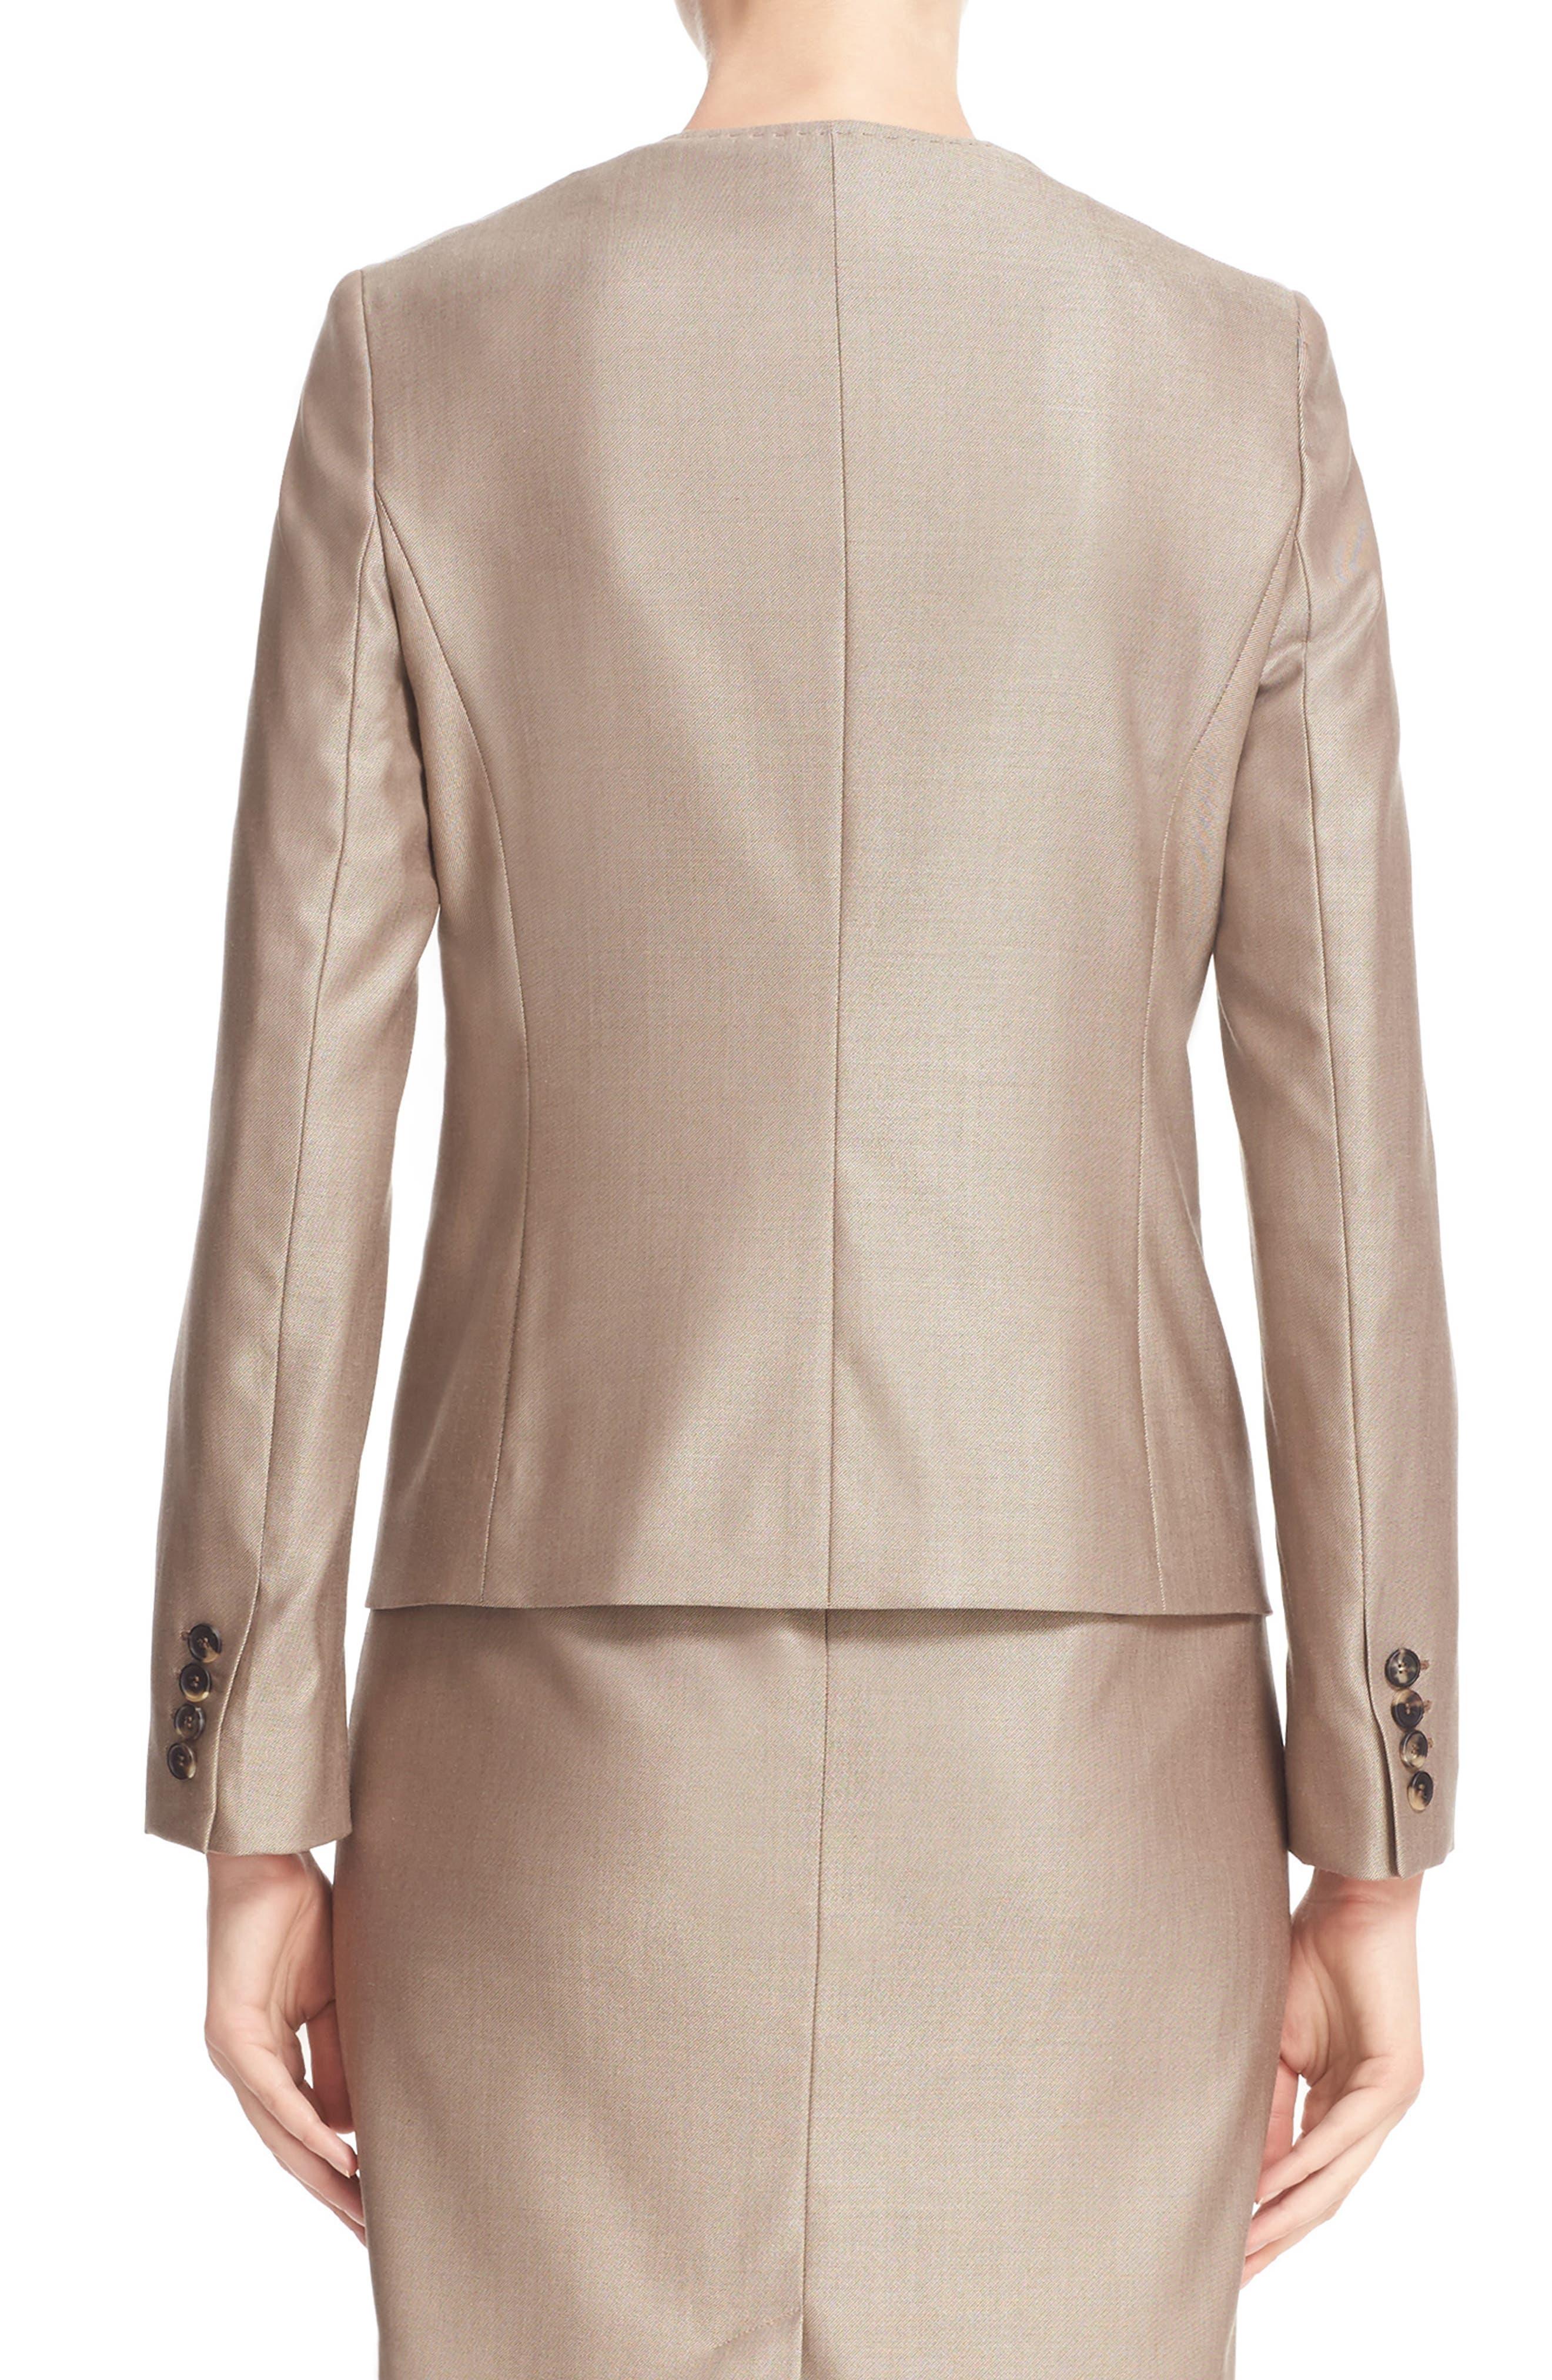 Erba Asymmetrical Jacket,                             Alternate thumbnail 3, color,                             220